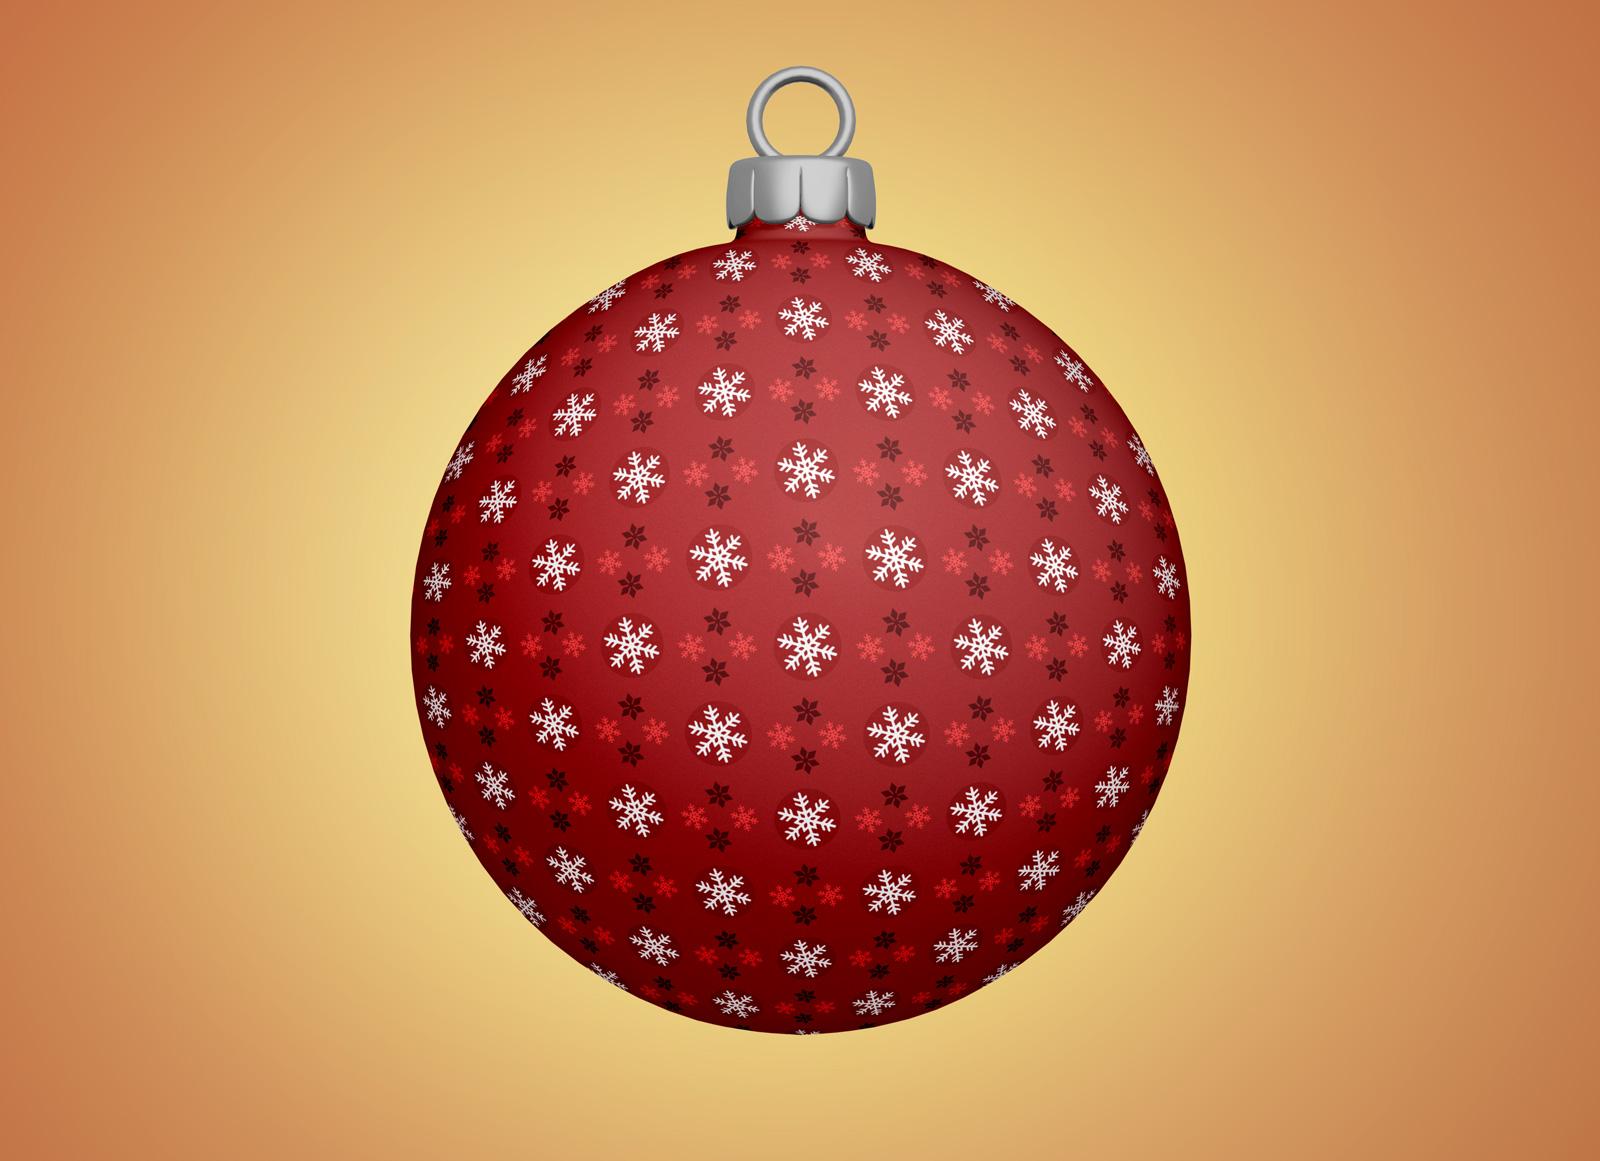 Free christmas tree bauble ball ornaments mockup psd good mockups